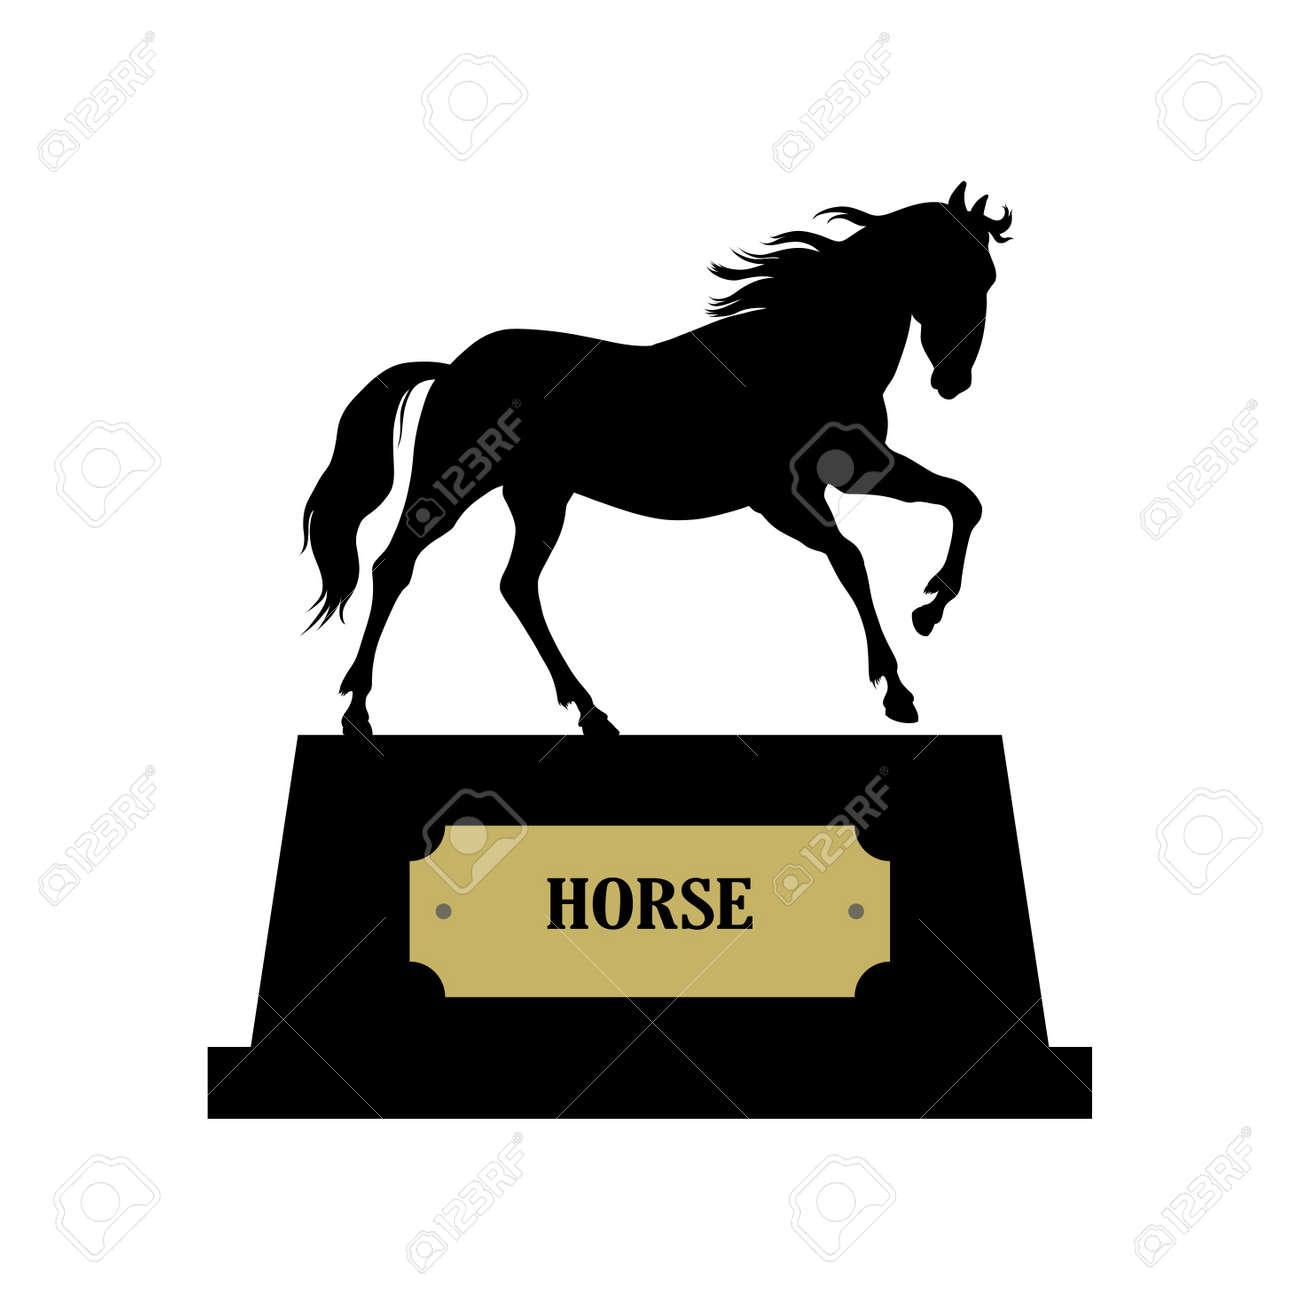 Horse symbol vector Stock Vector - 14988314